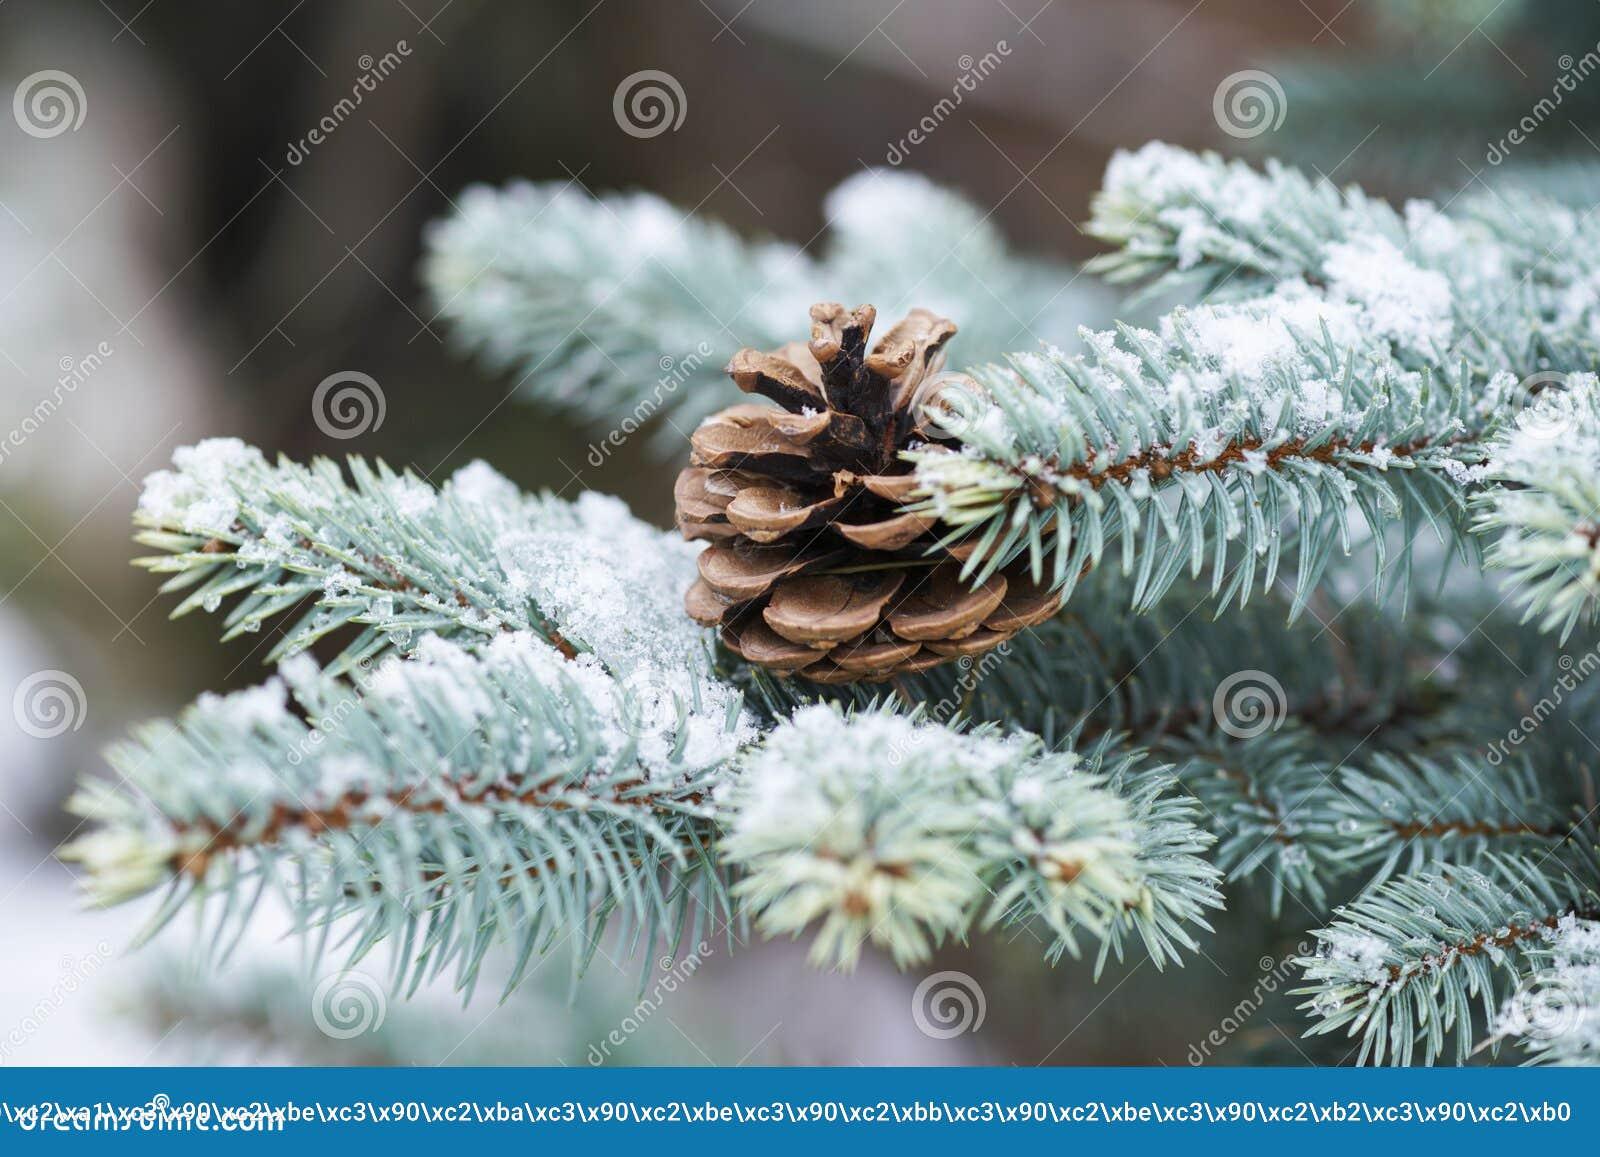 Dream Dream Fir, spruce, what dreams of Fir, spruce in a dream to see 55